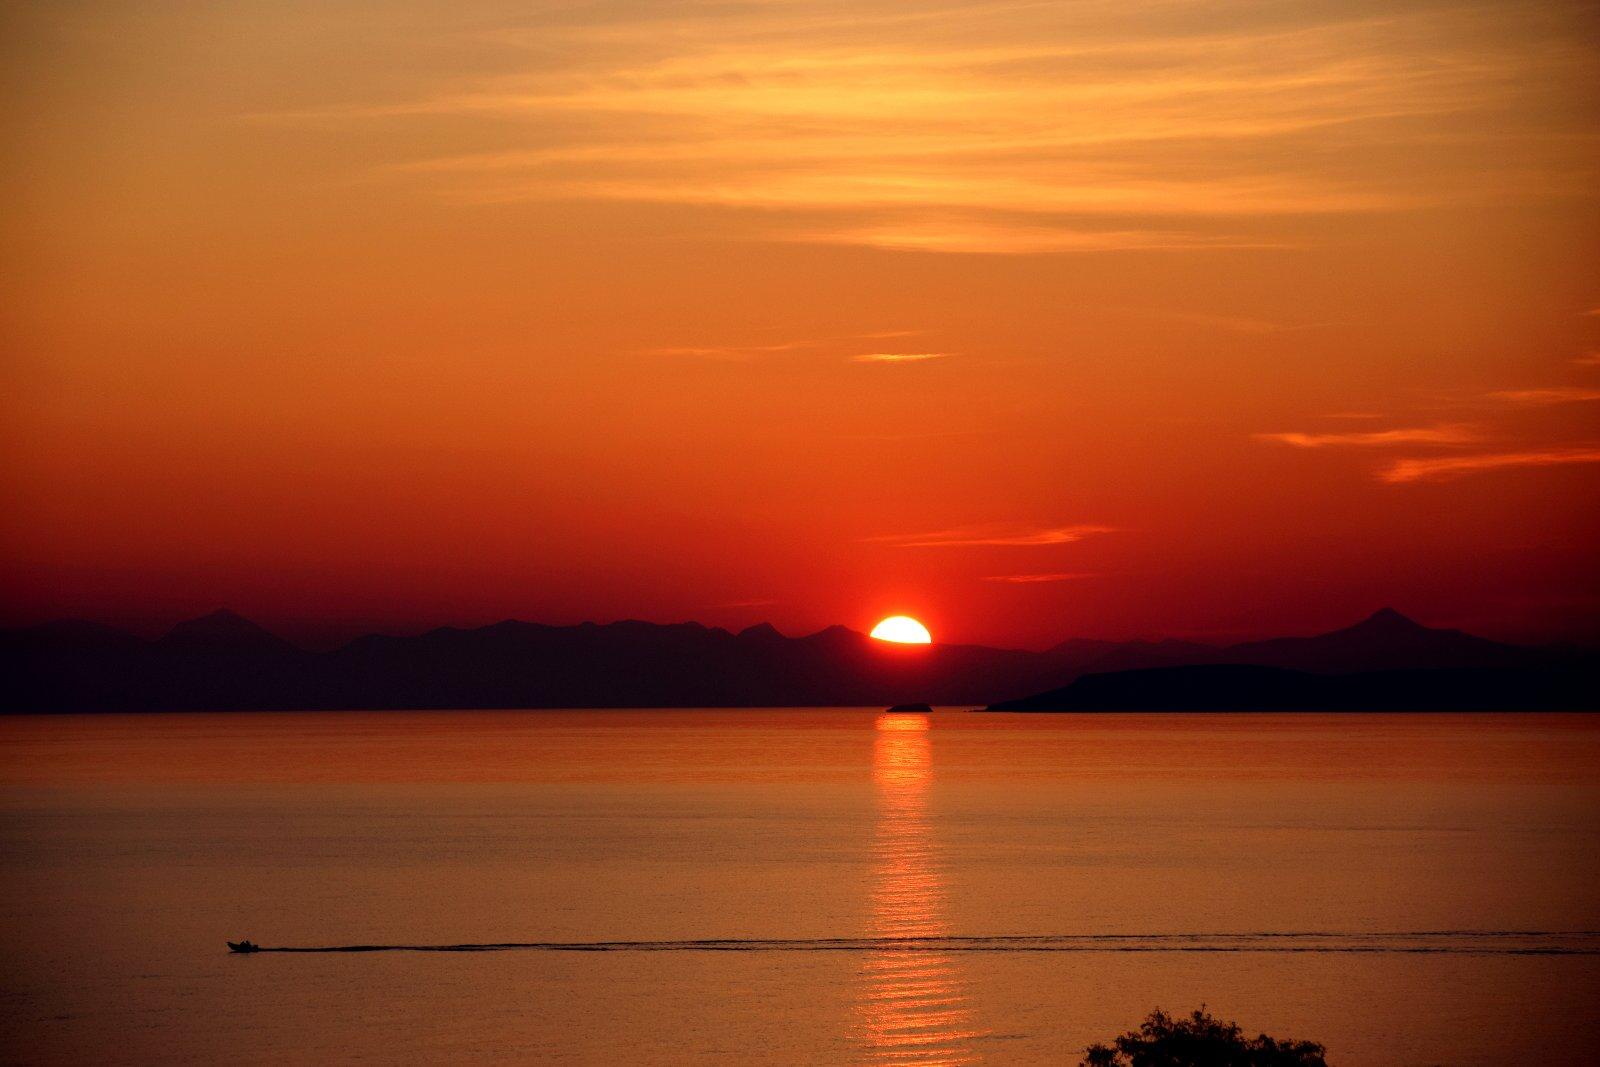 Sunset in Kalivia Thorikou, Lagonisi, Greece. Source: Konstantinos Matzarakis